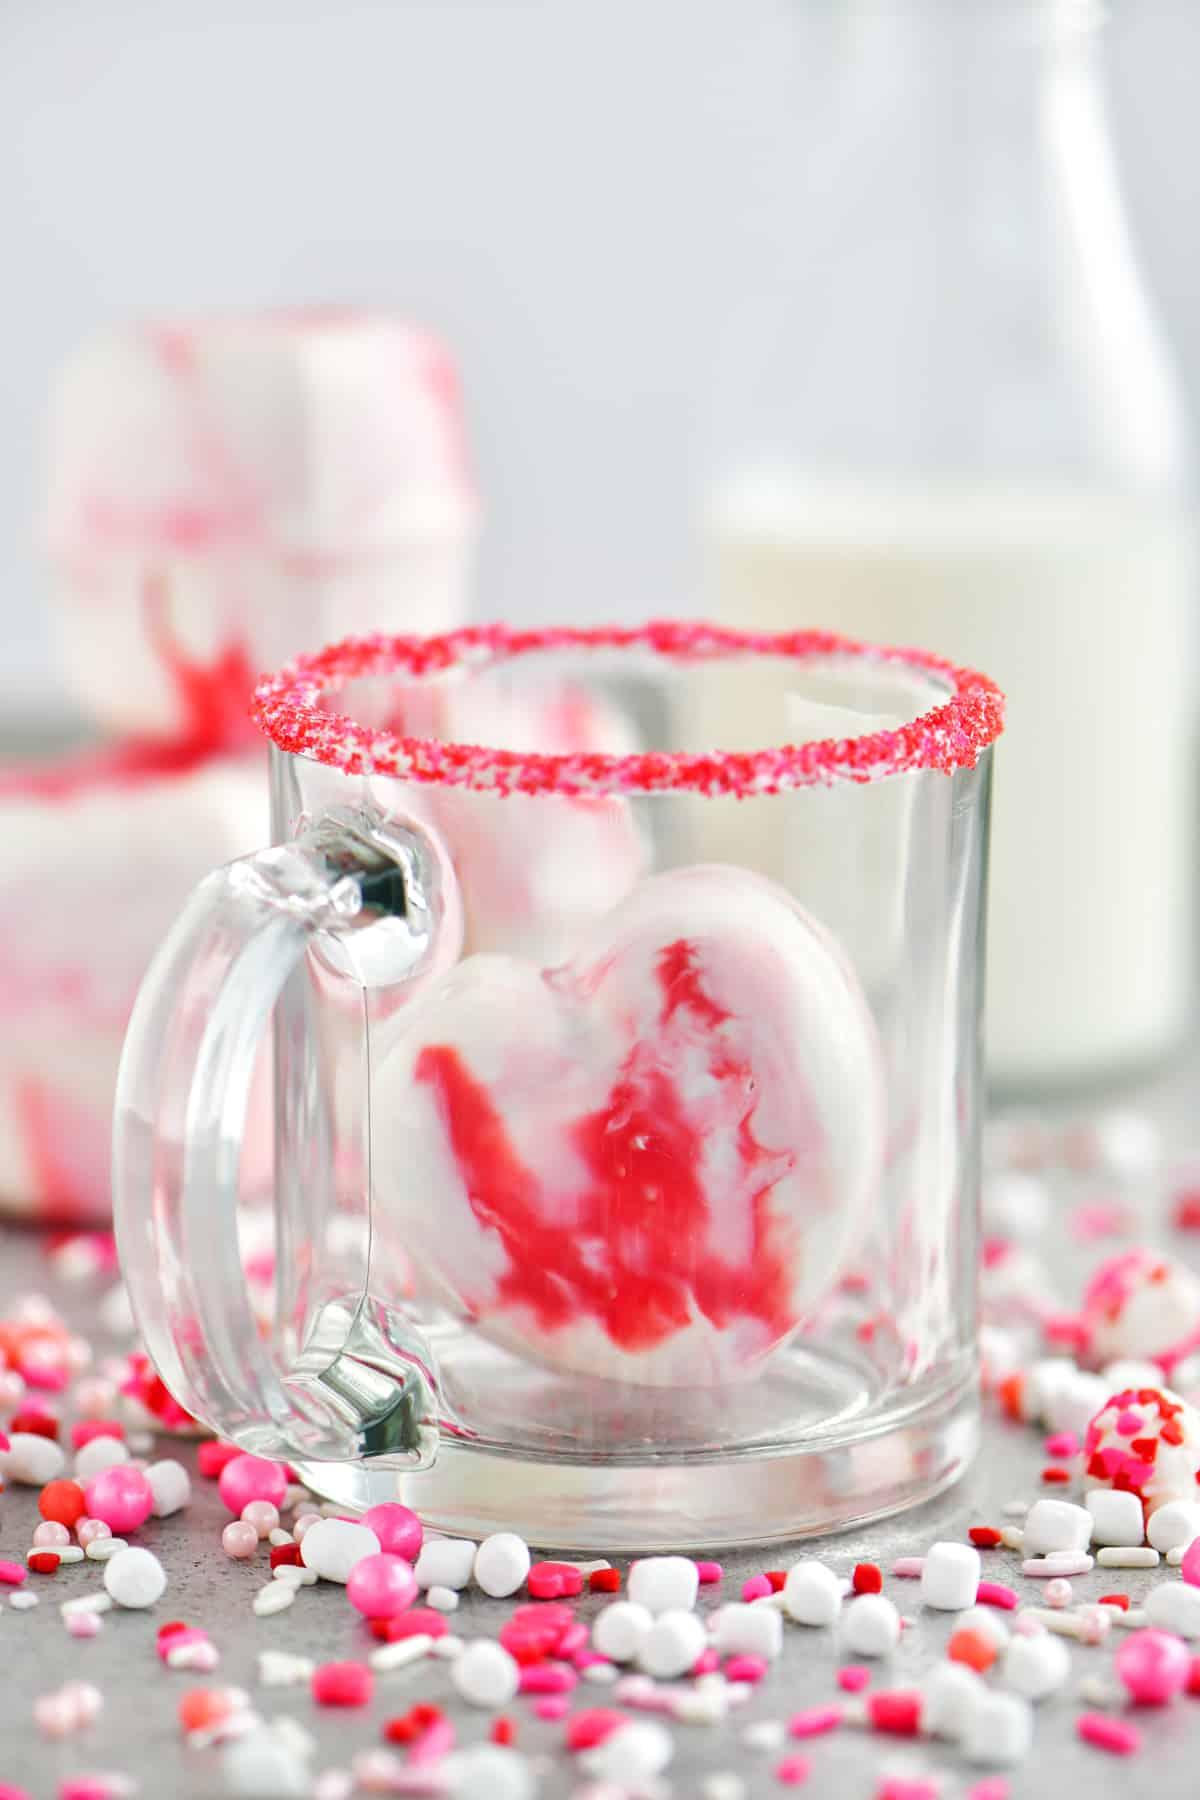 heart shaped hot chocolate bomb in a mug